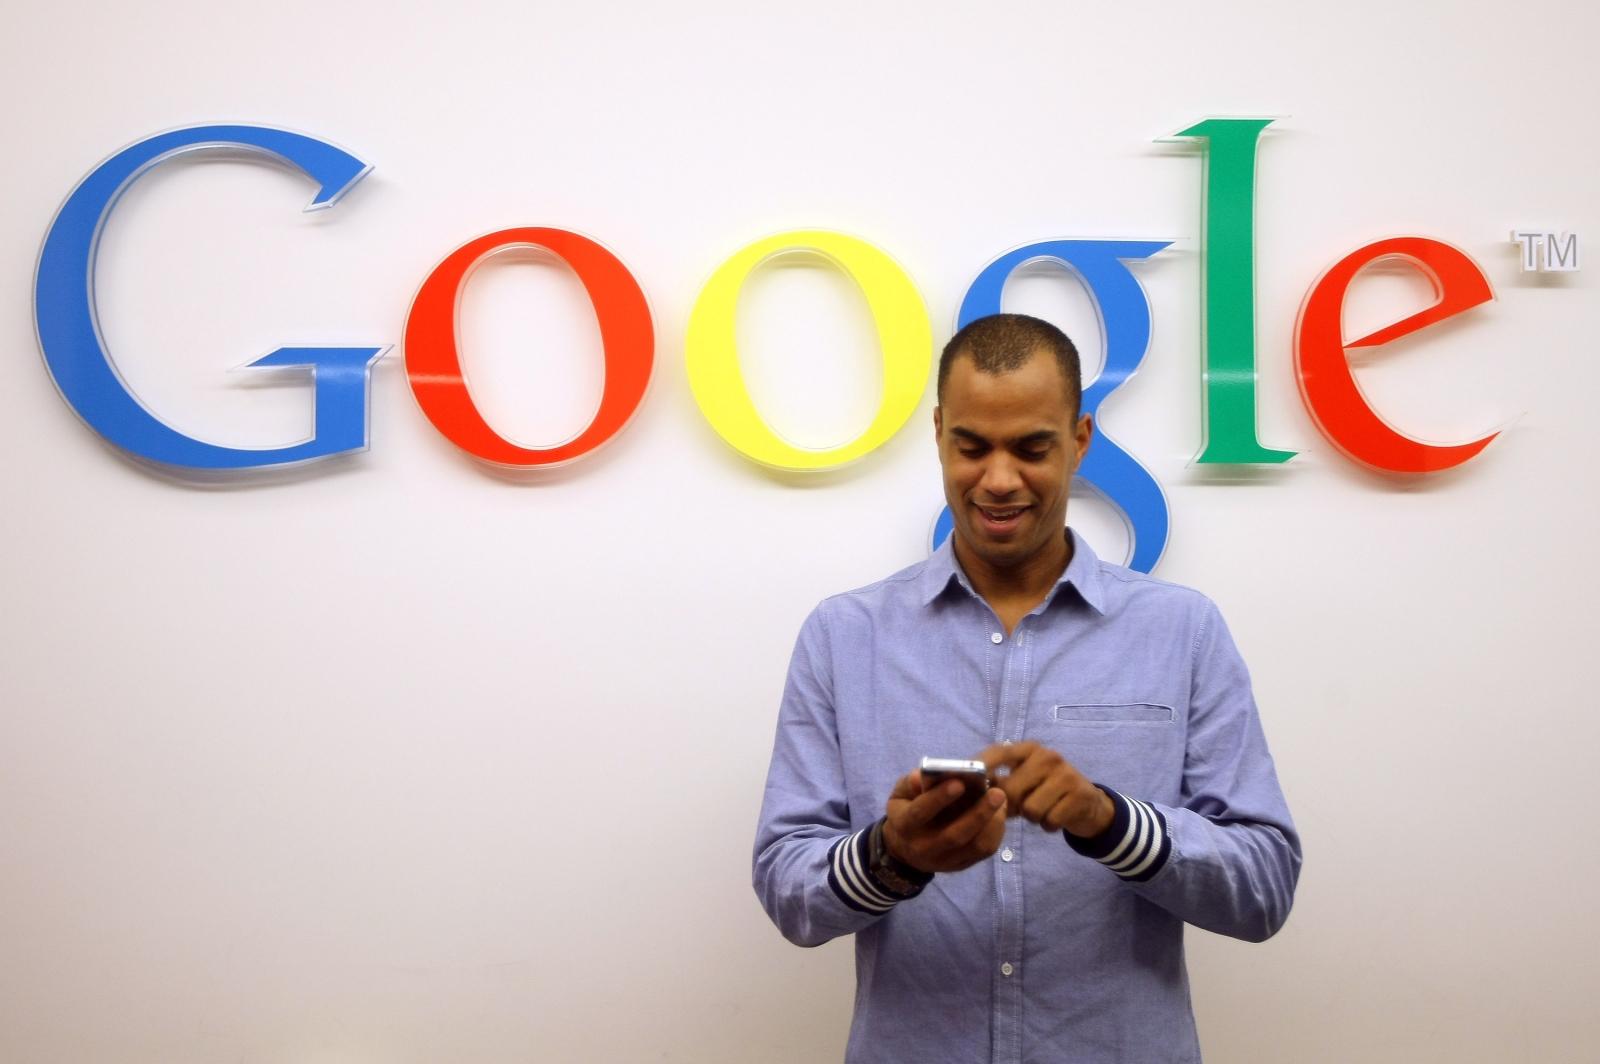 Mobilegeddon Google search algorithm changes